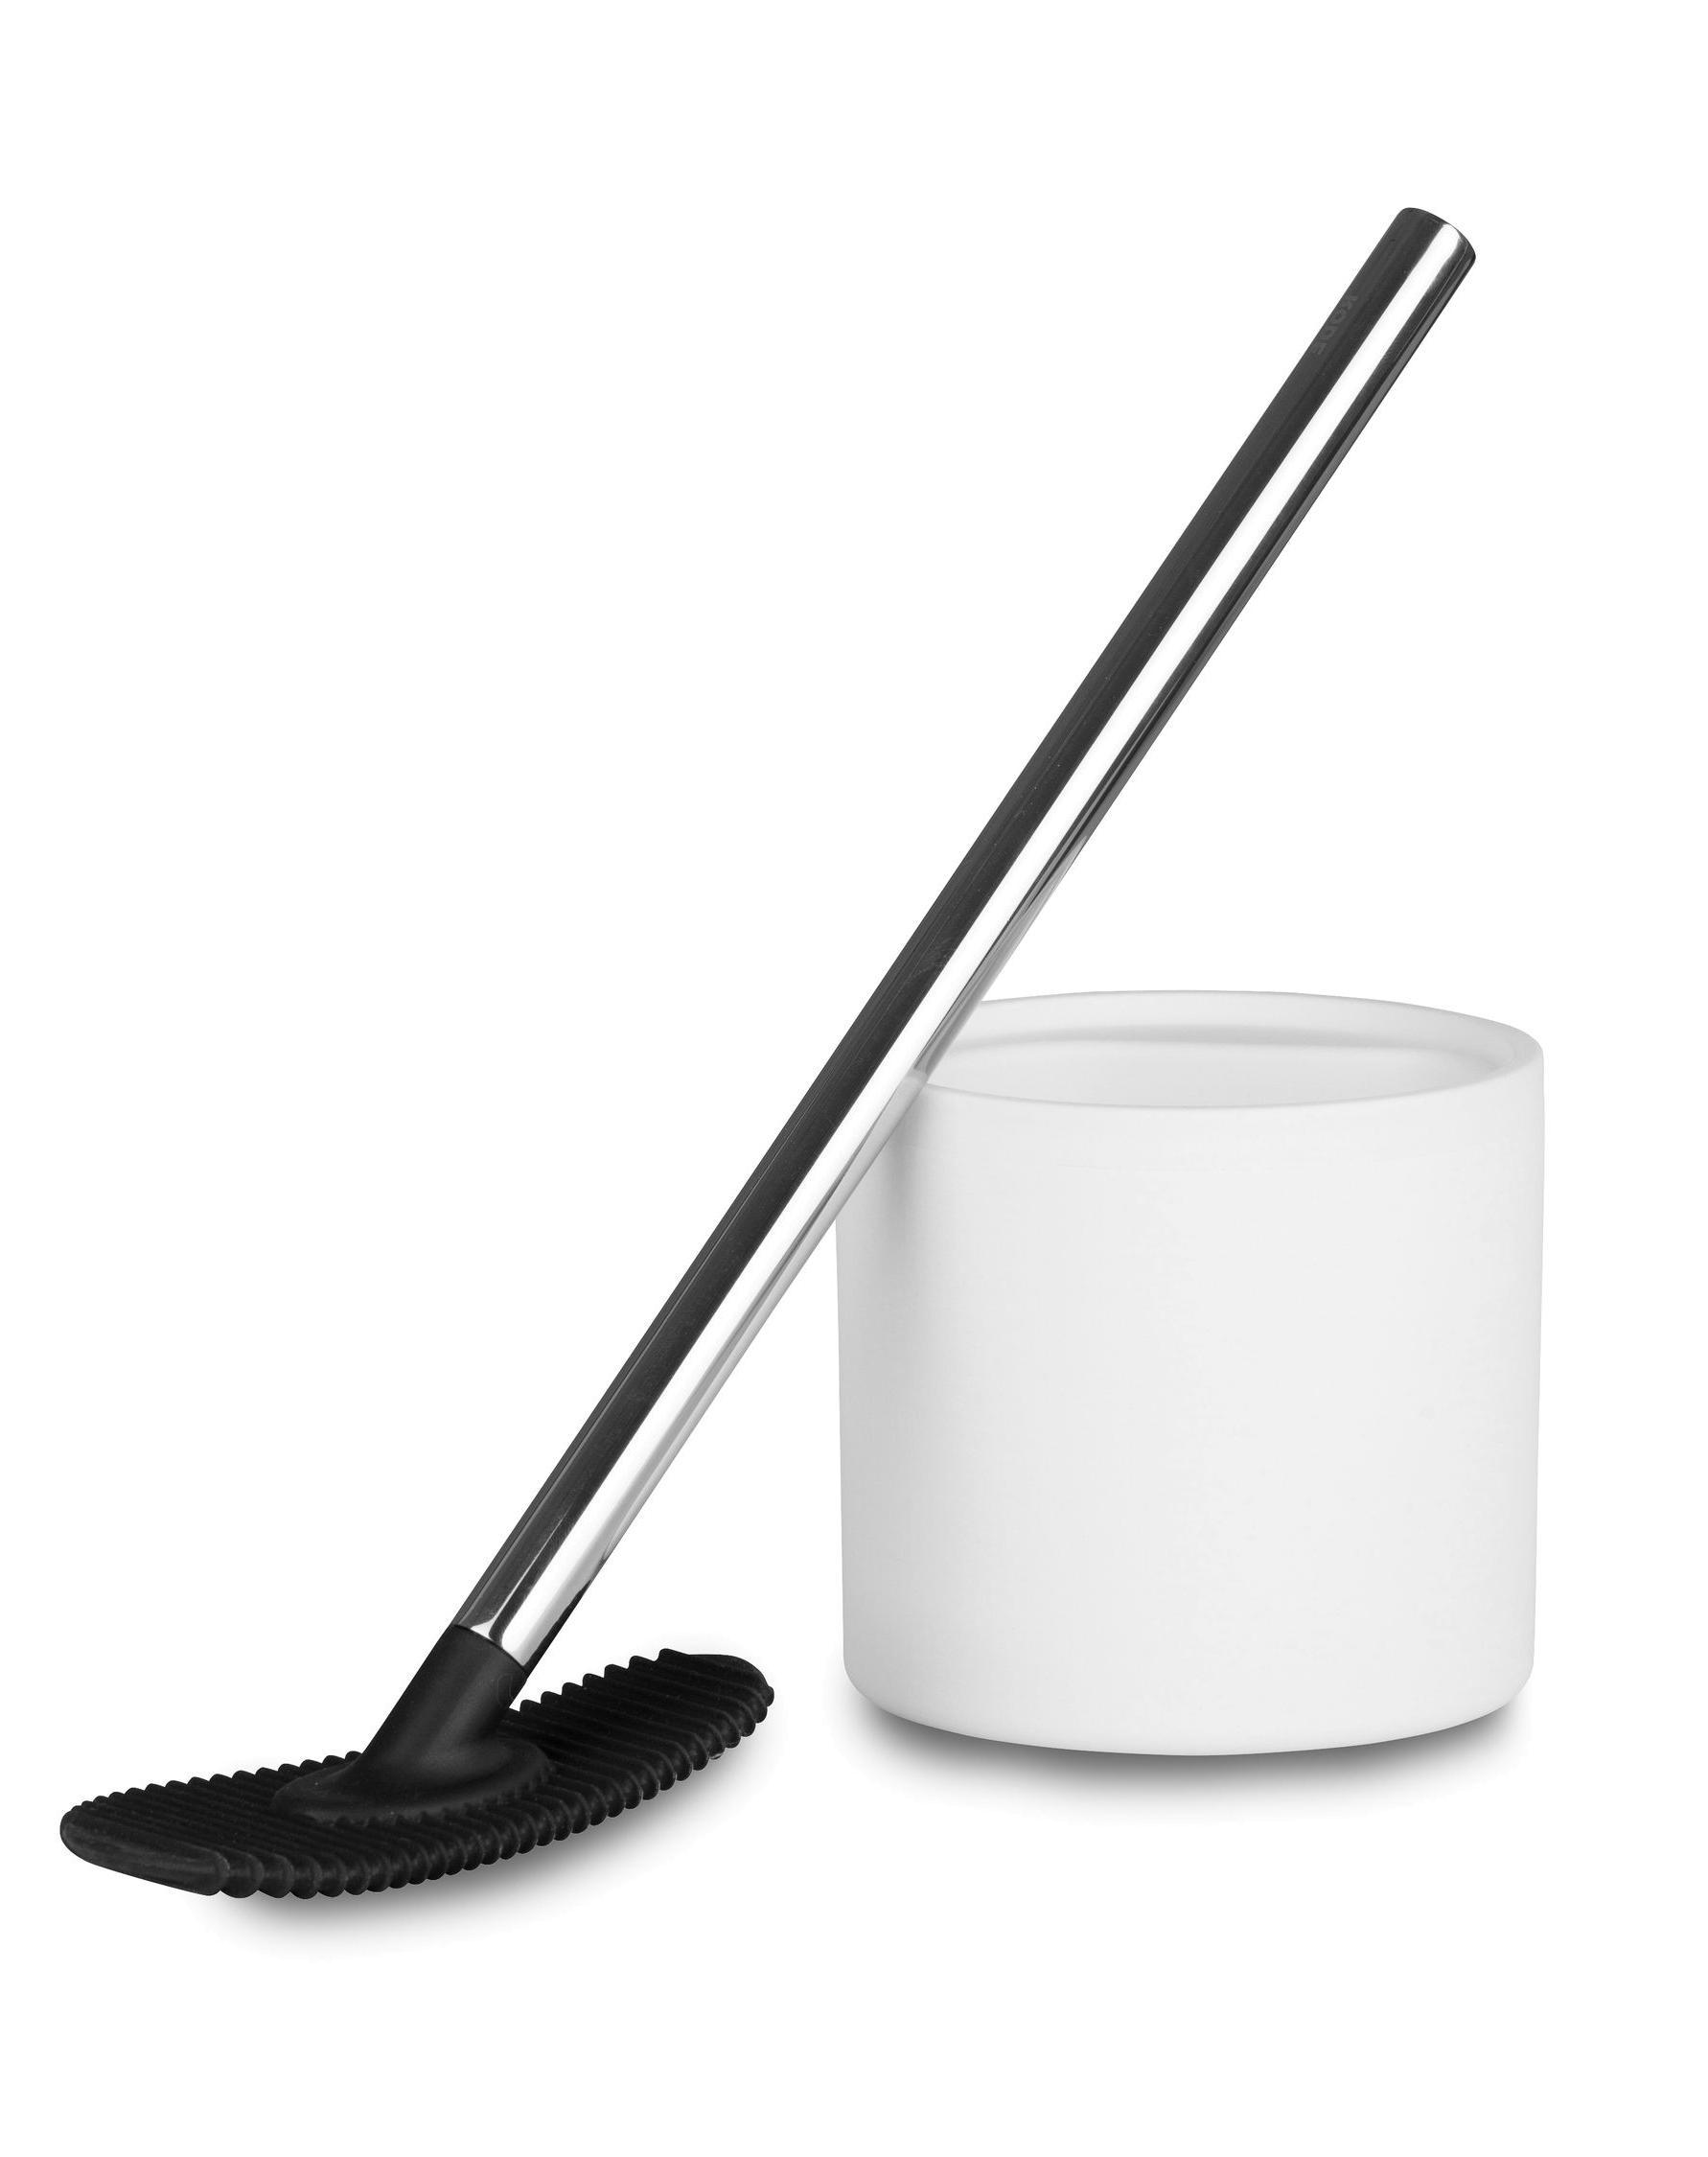 neuartige wc b rste ohne borsten. Black Bedroom Furniture Sets. Home Design Ideas